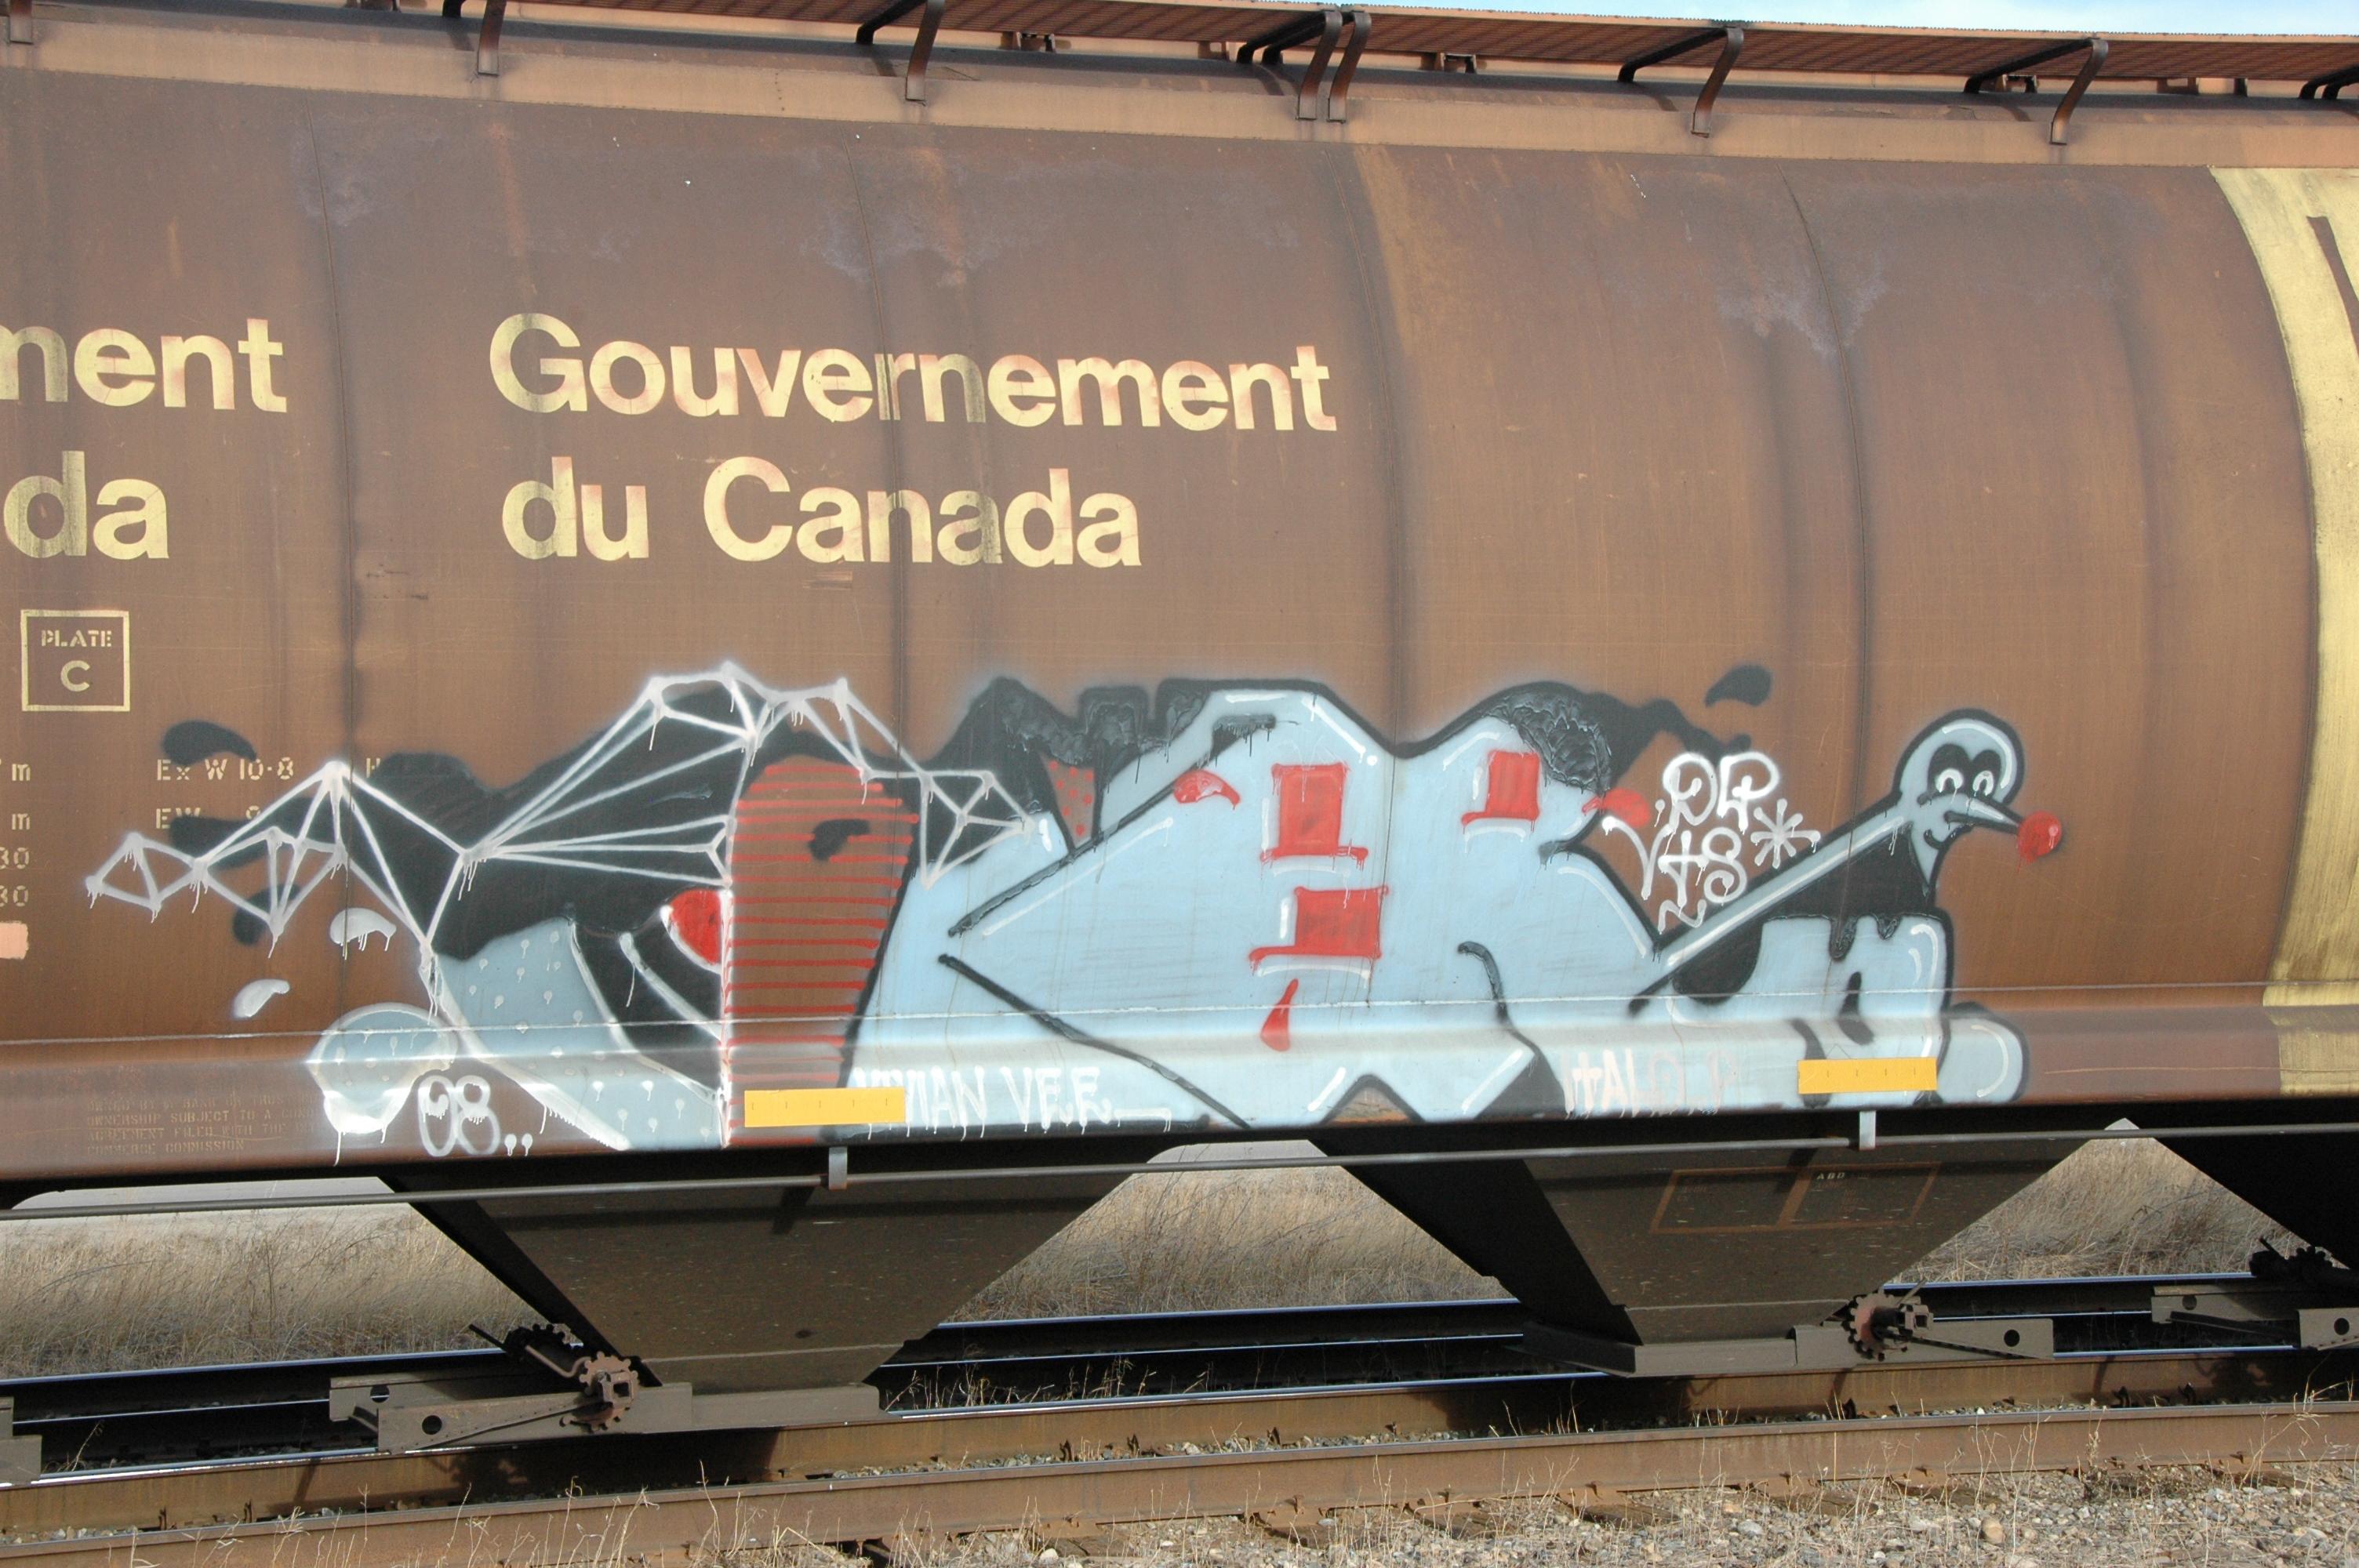 Masaustu Demiryolu Kanada Sanat Tren Fotograf Duvar Yazisi